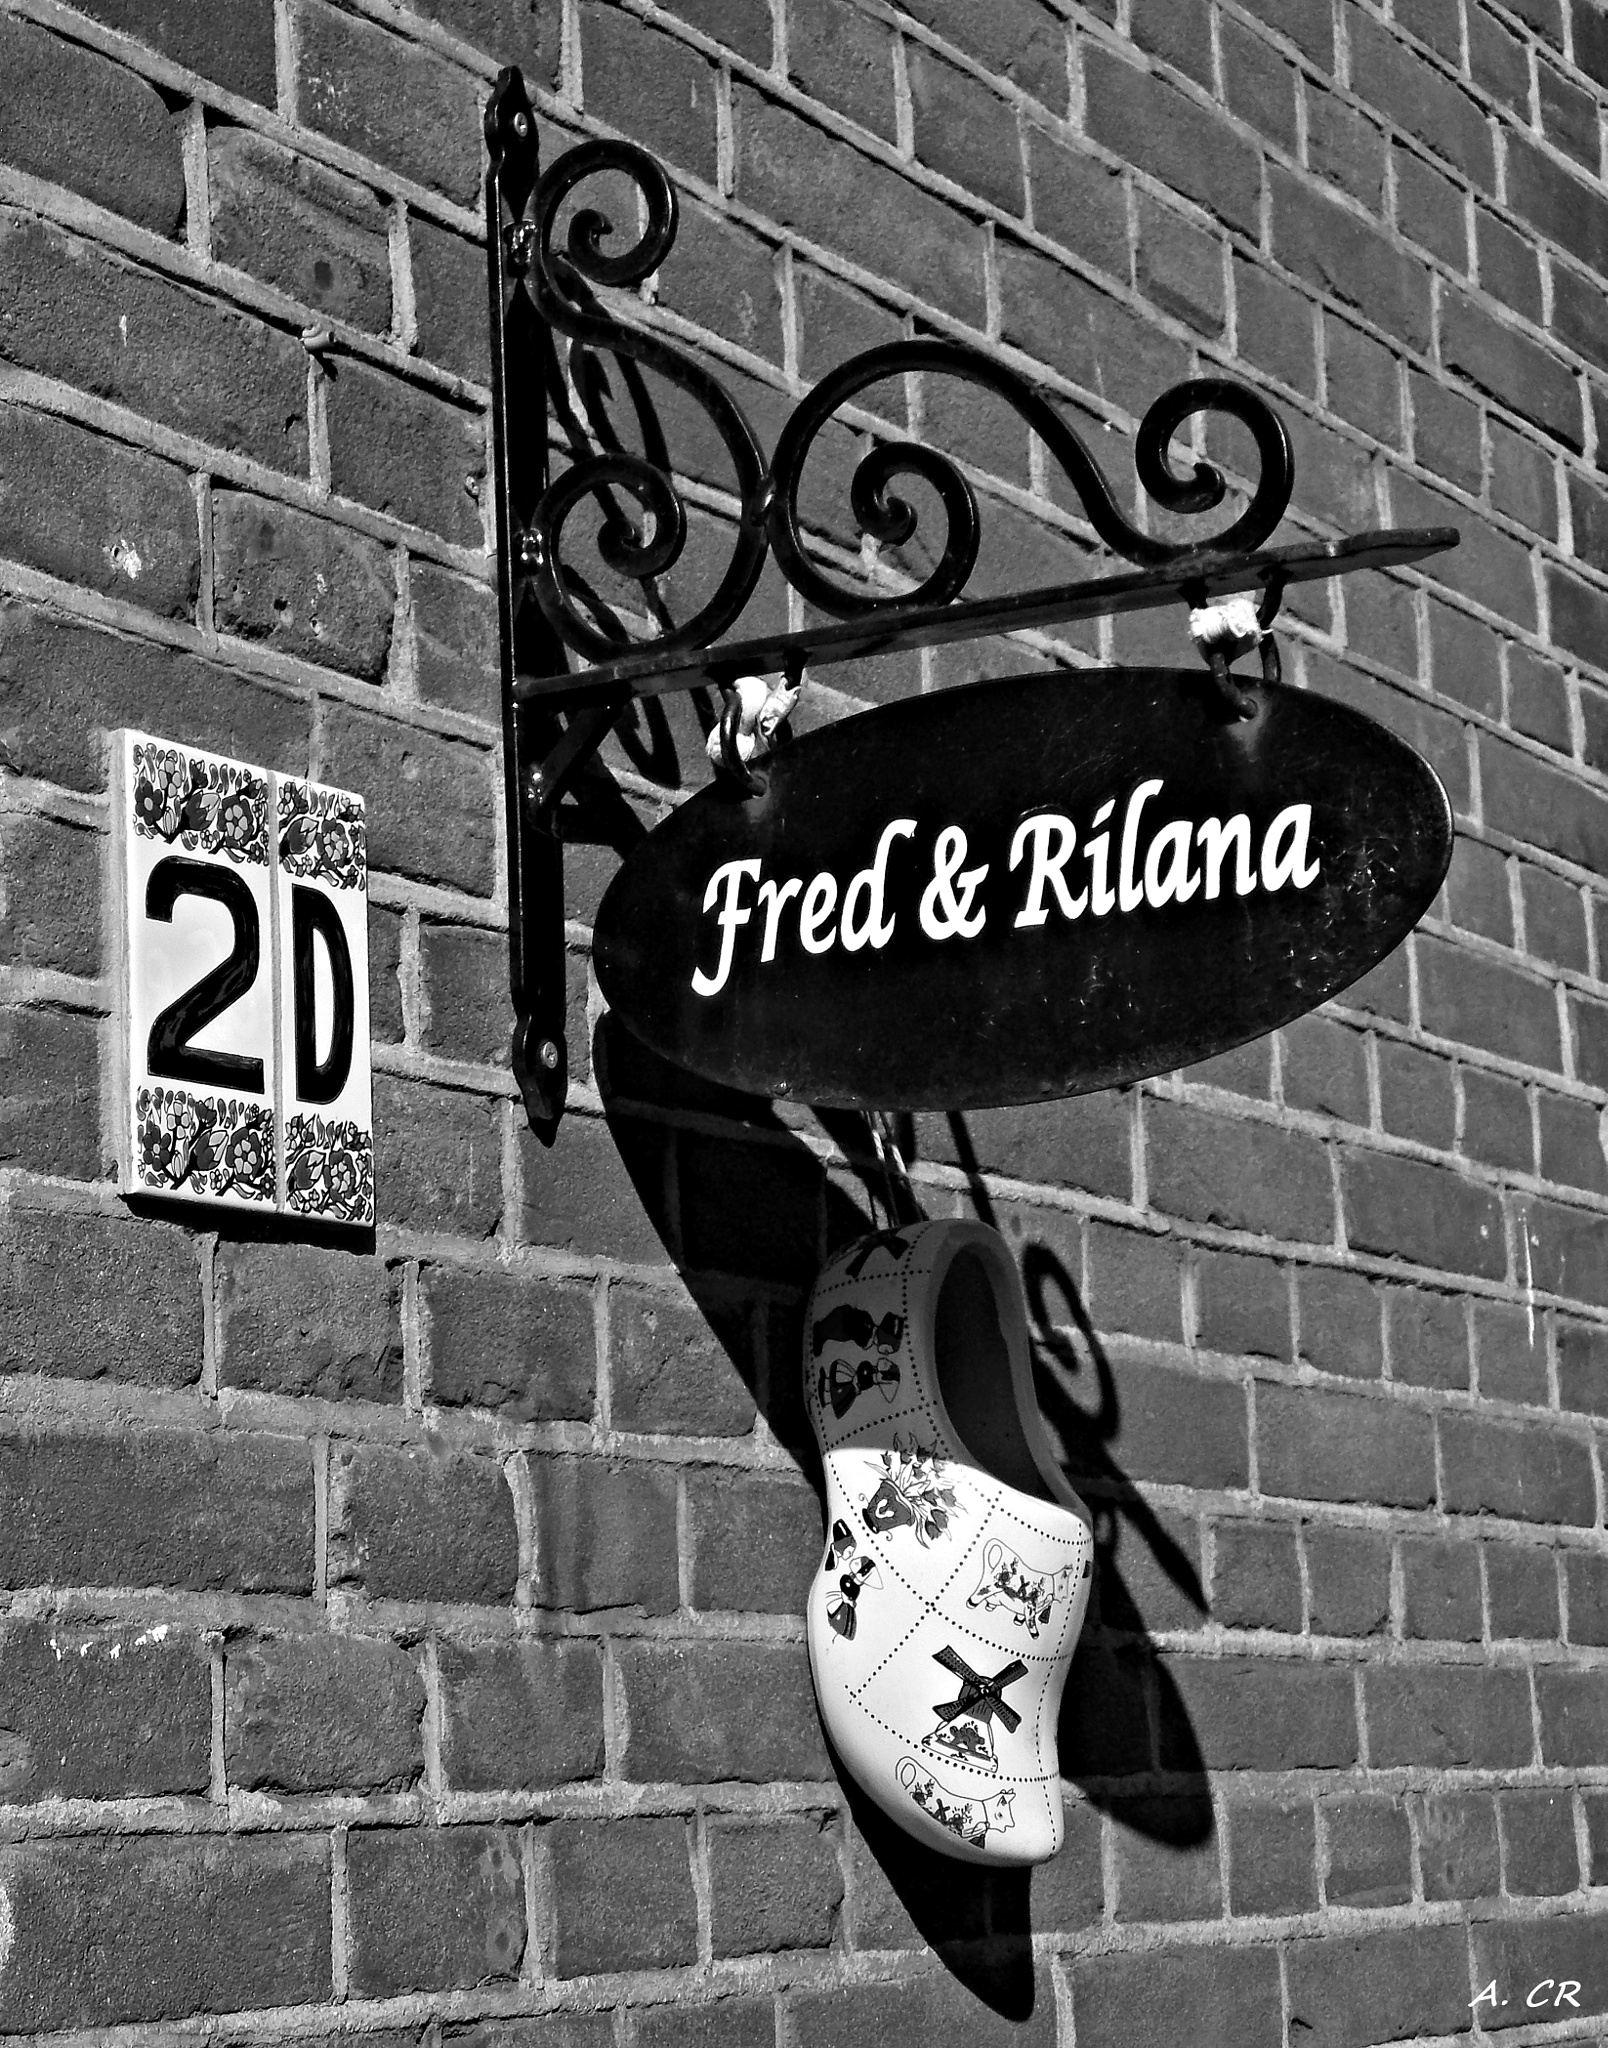 Fred & Rilana by A. Castellano Rodriguez